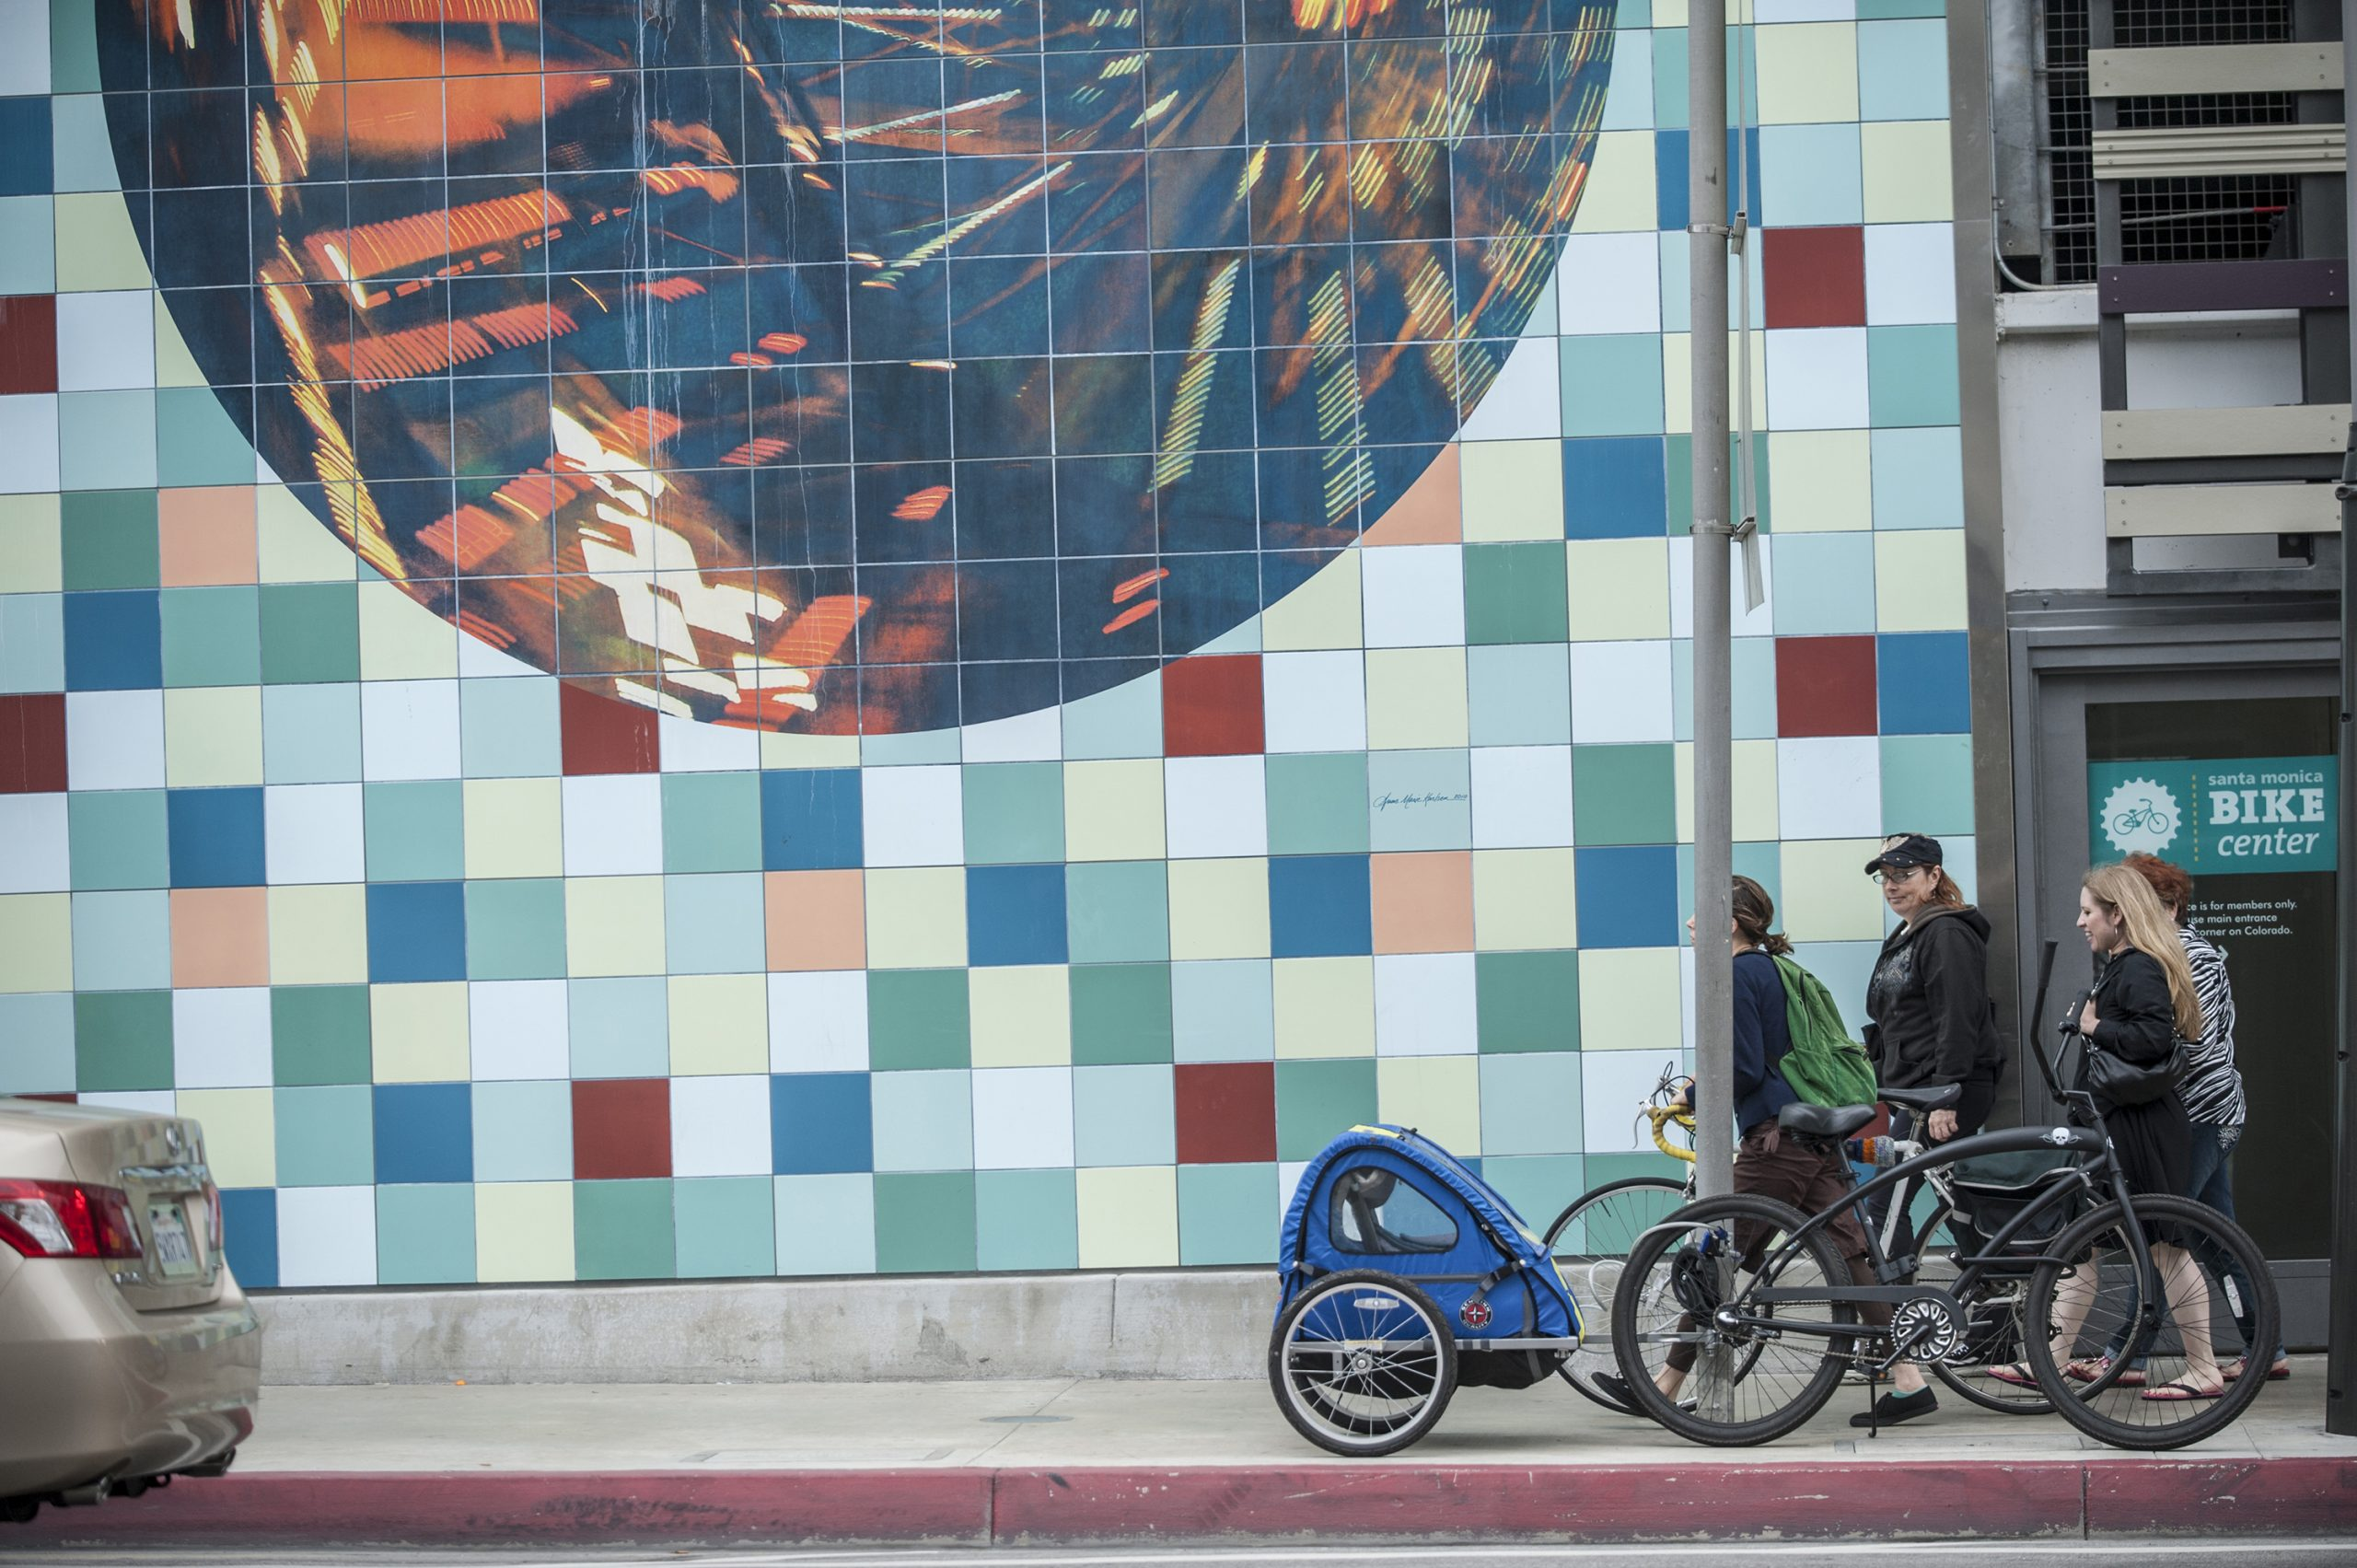 Wheels: Santa Monica Place Parking Garage